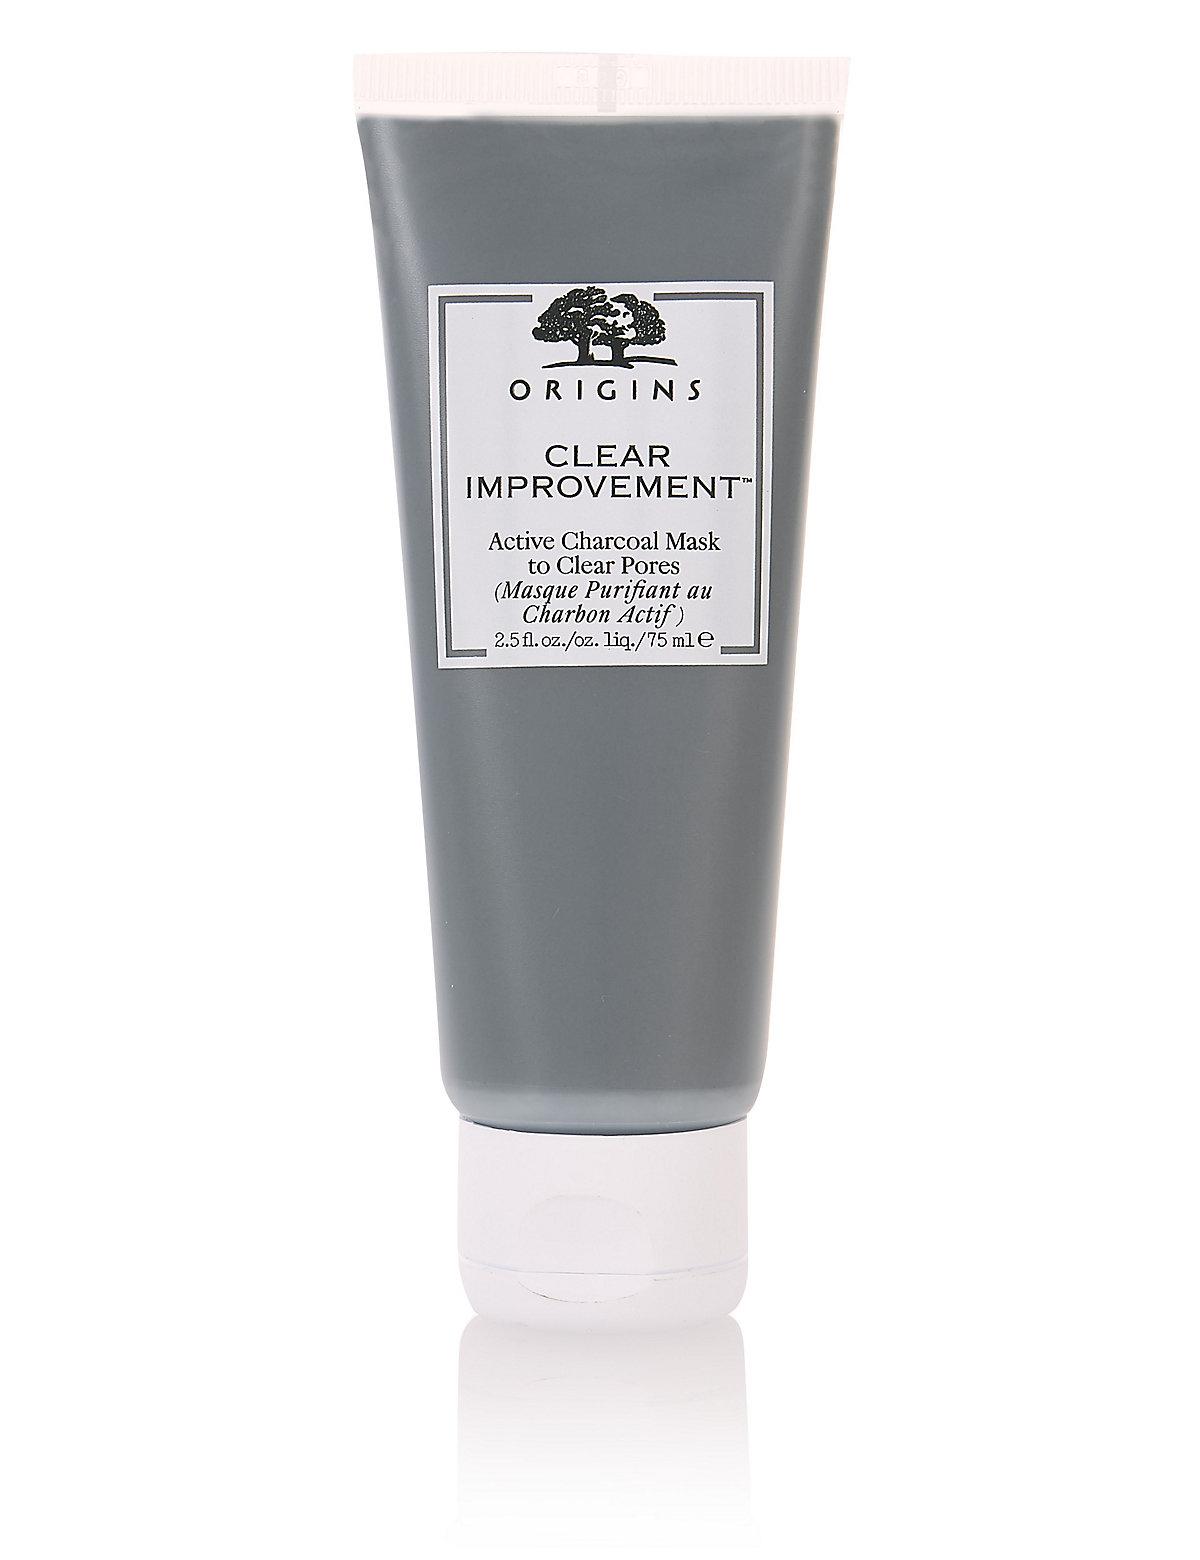 Origins Clear Improvement Active Charcoal Mask 75ml